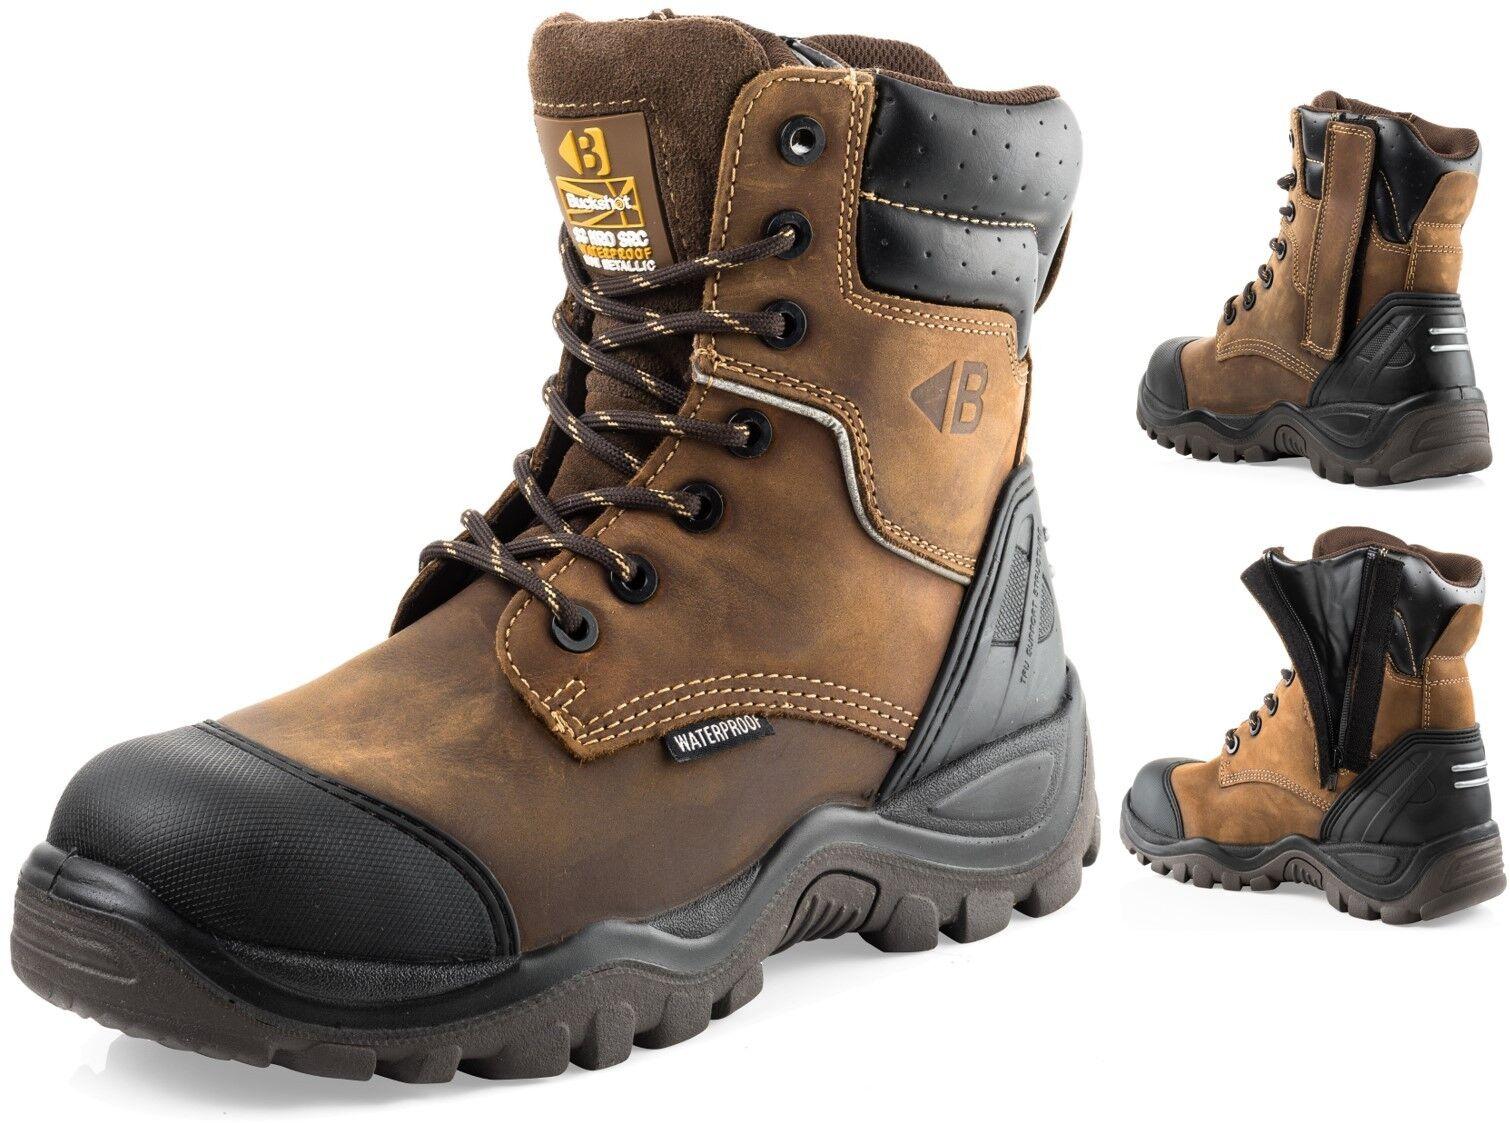 Buckler Buckshot BSH008WPNM HRO Brown Leather Waterproof Lace Zip safety boot CG